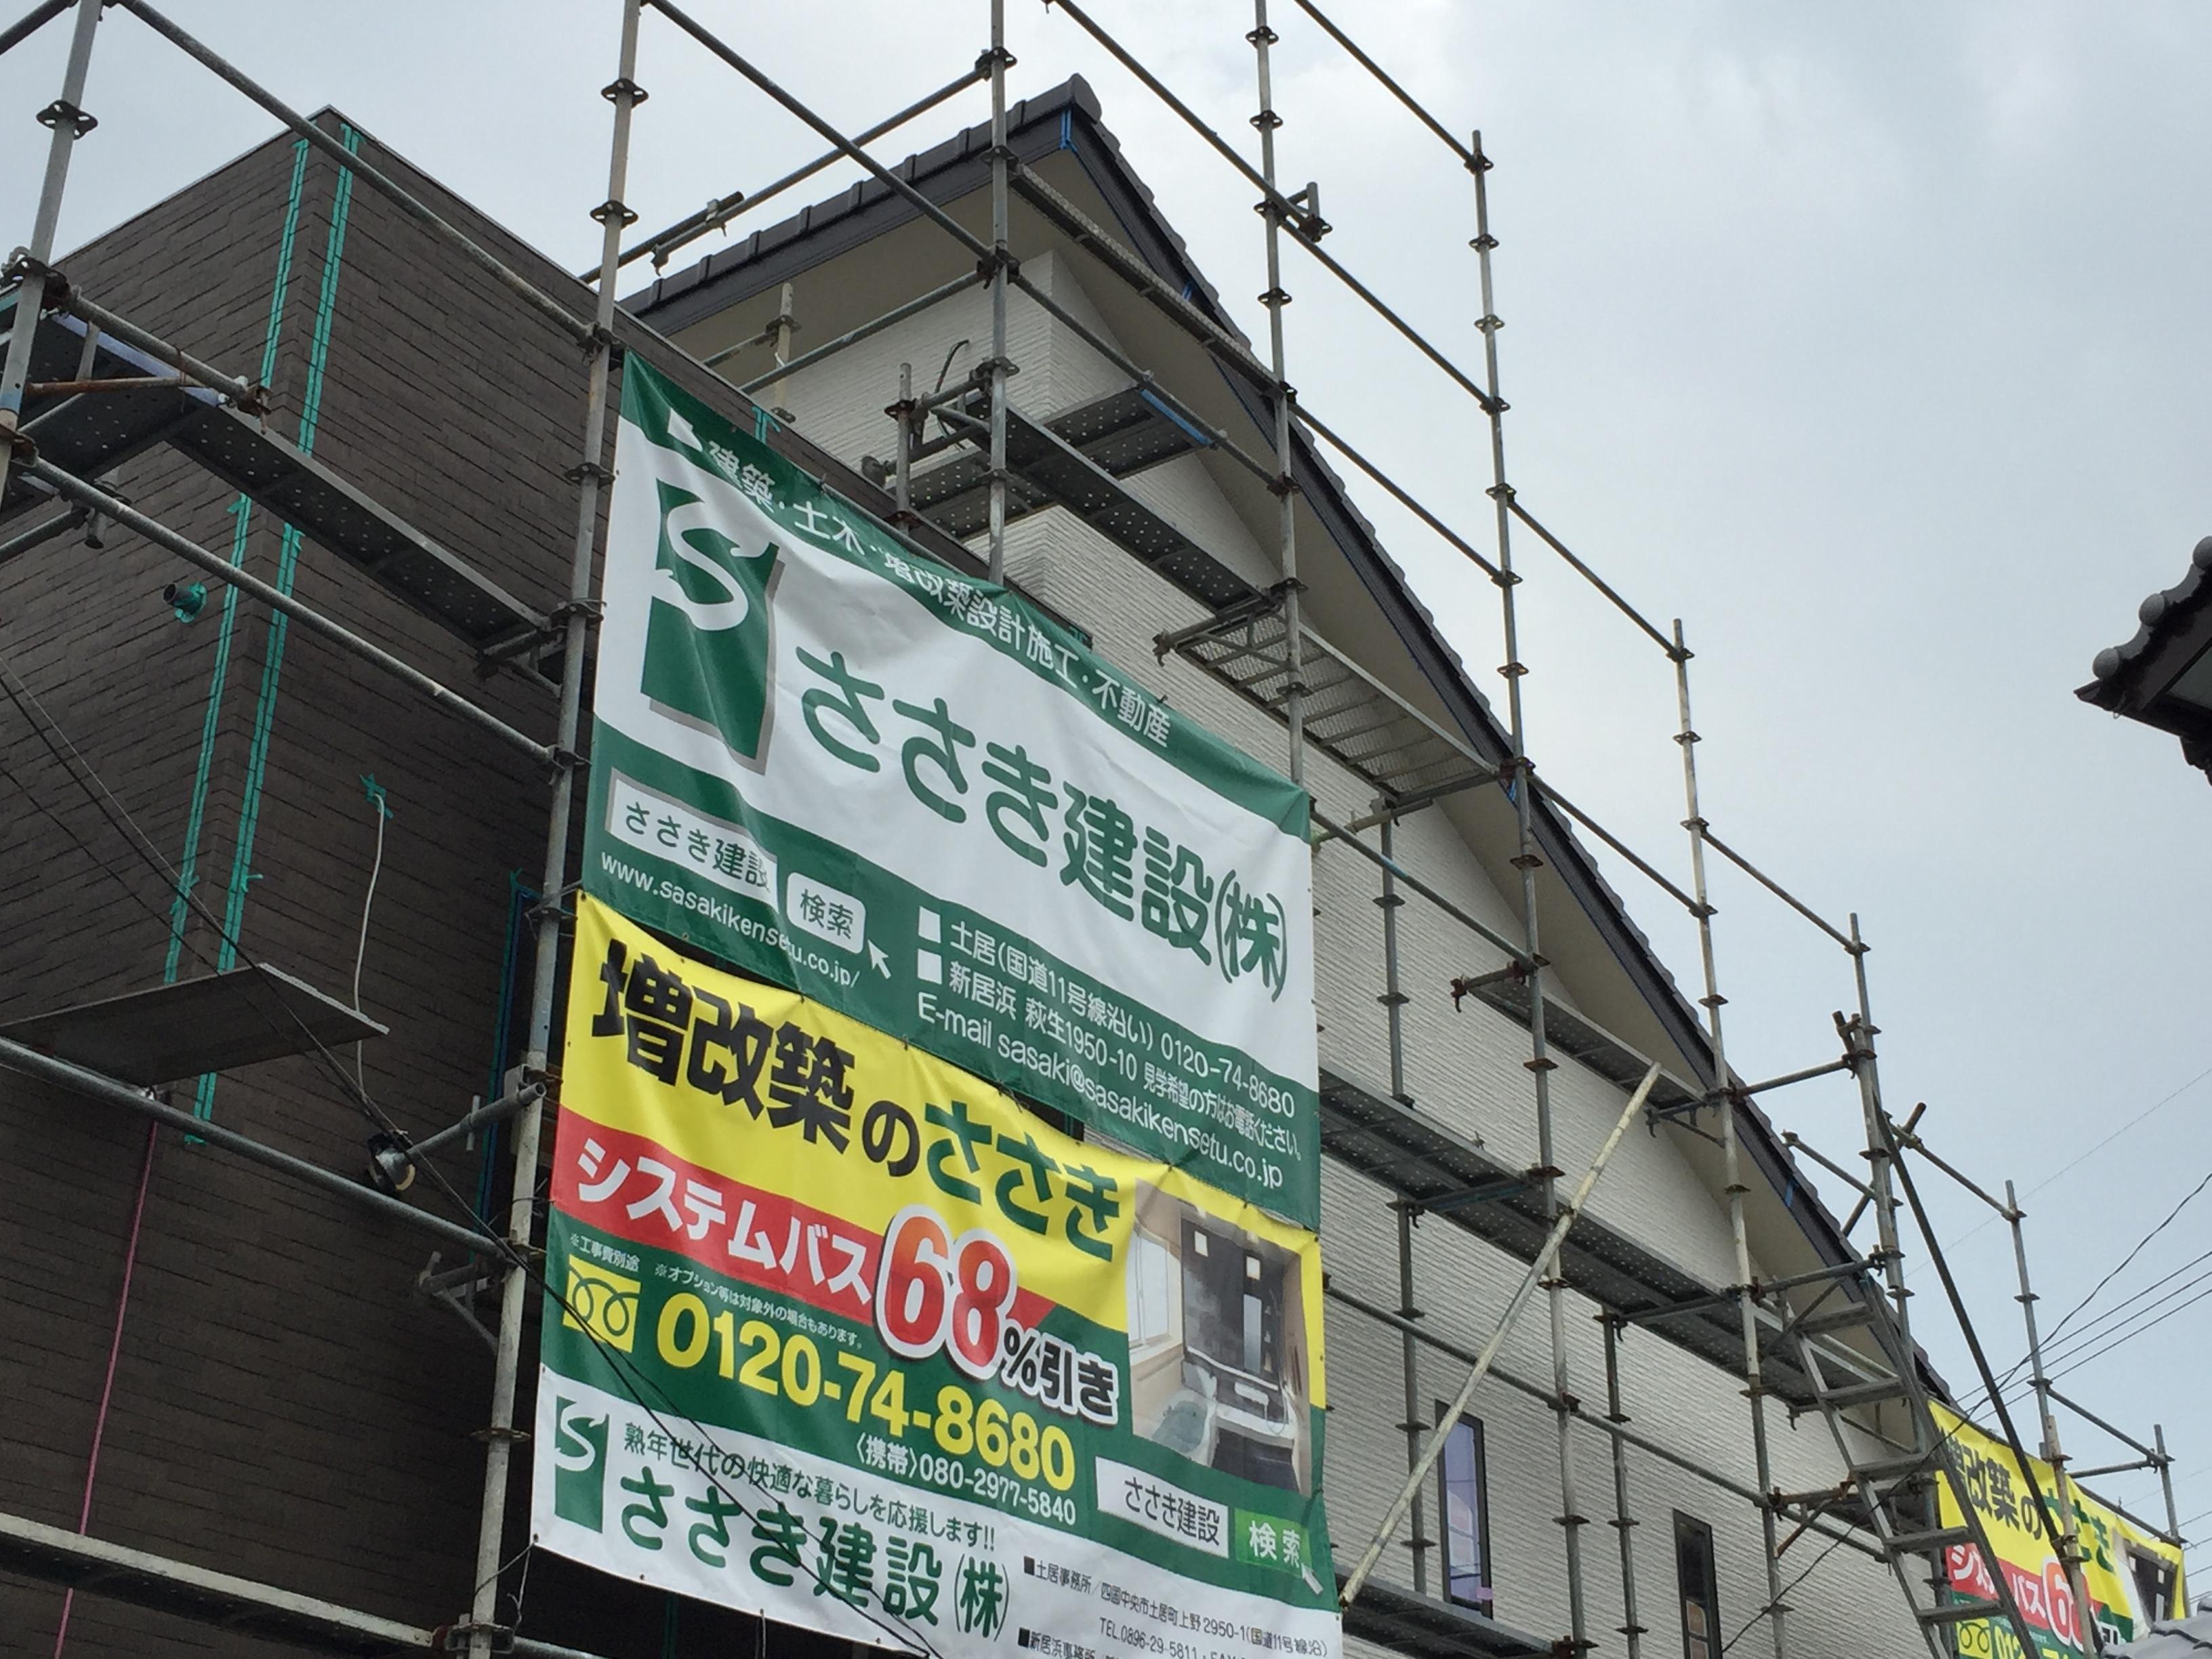 西条市で住宅新築の外観写真